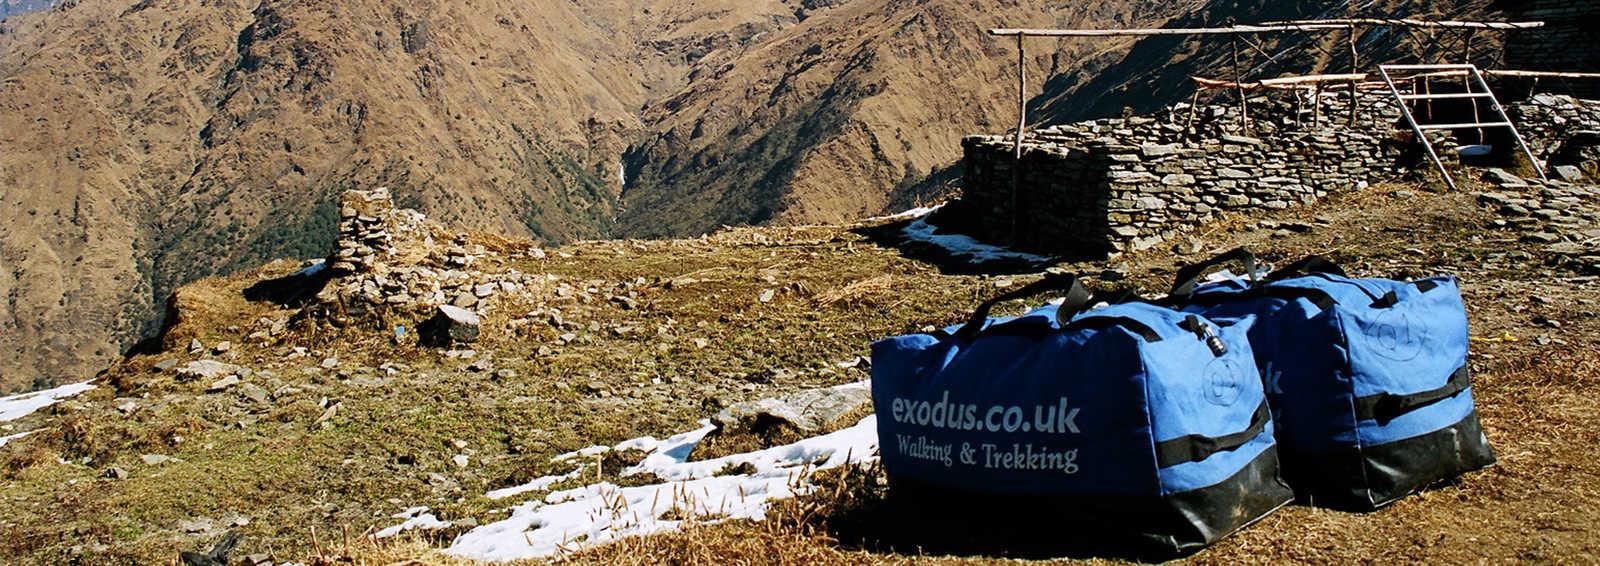 Campsite with kitbags amd peaks, Kopra Ridge, Himalaya